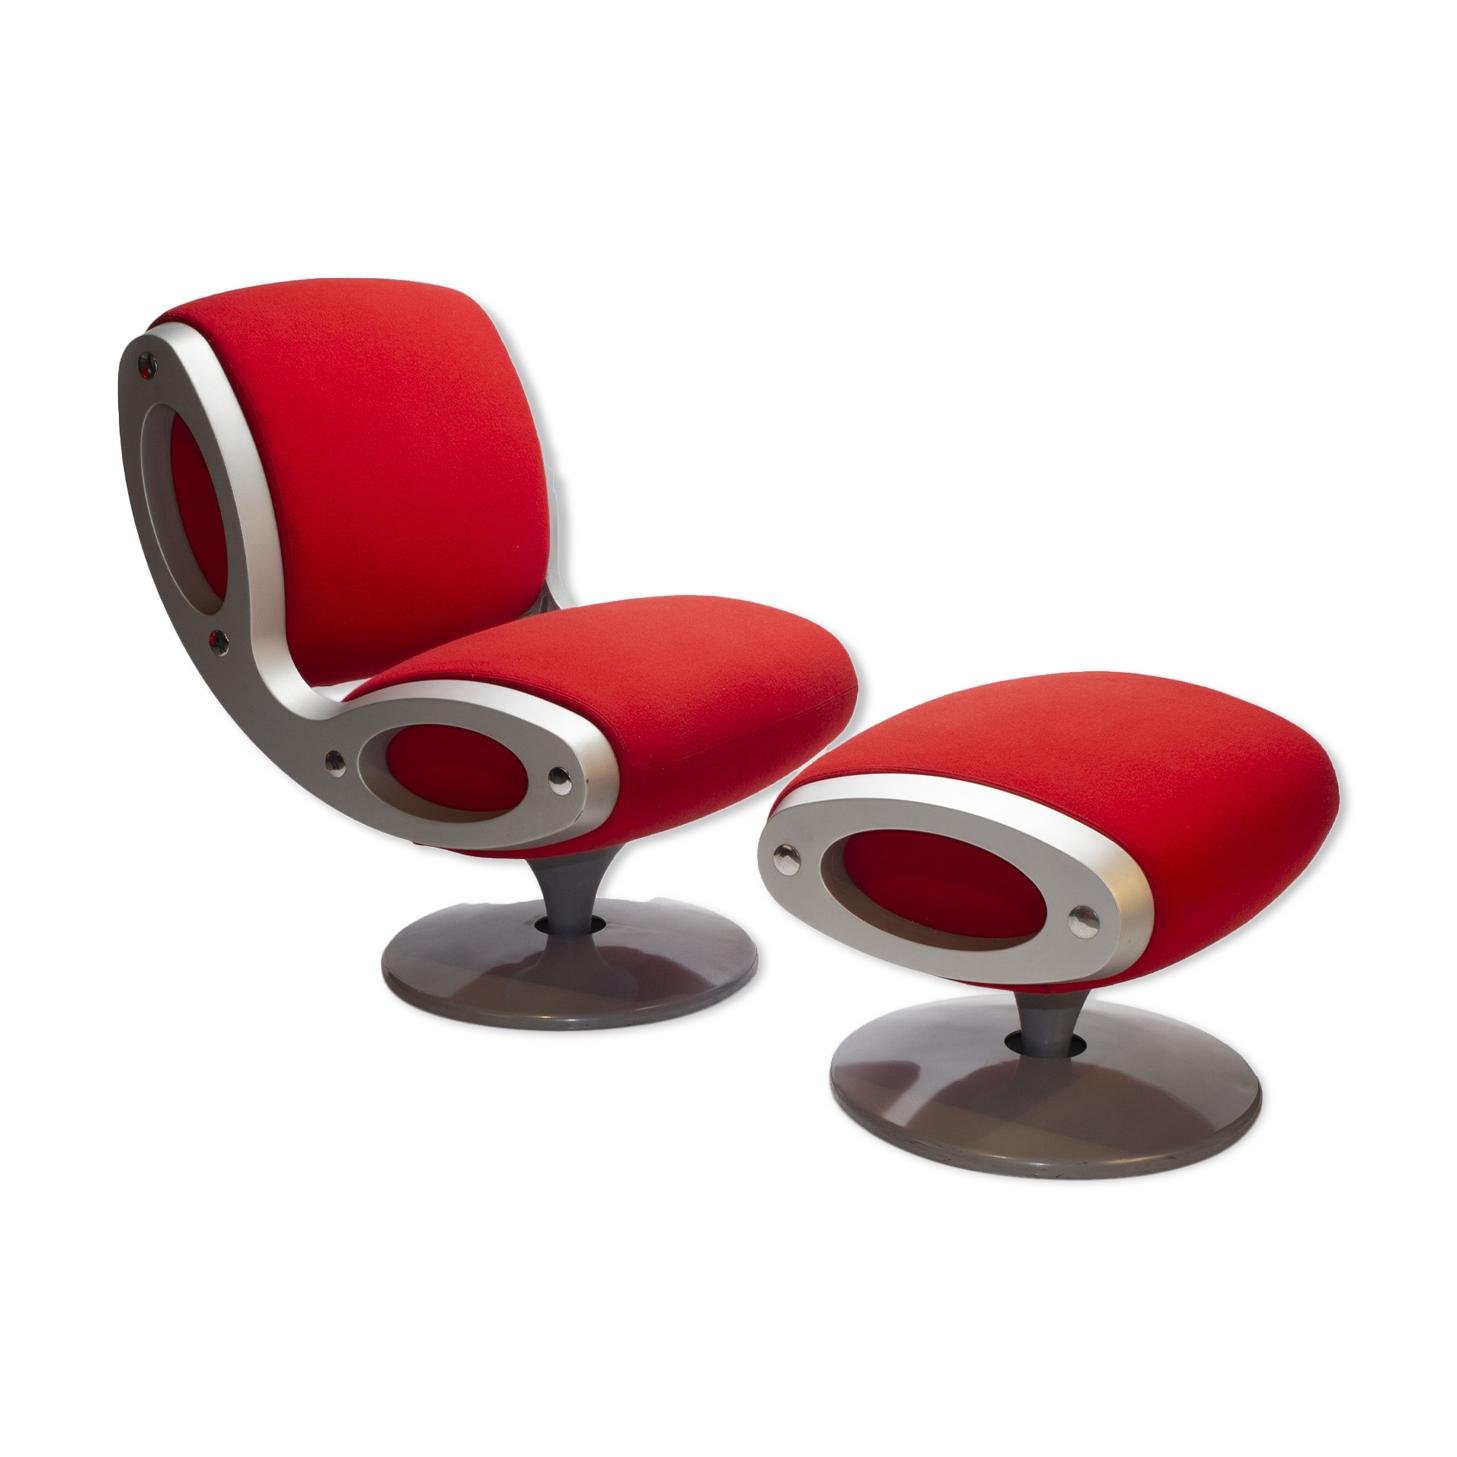 Red Gluon chair & stool par Marc Newson pour Moroso Italie